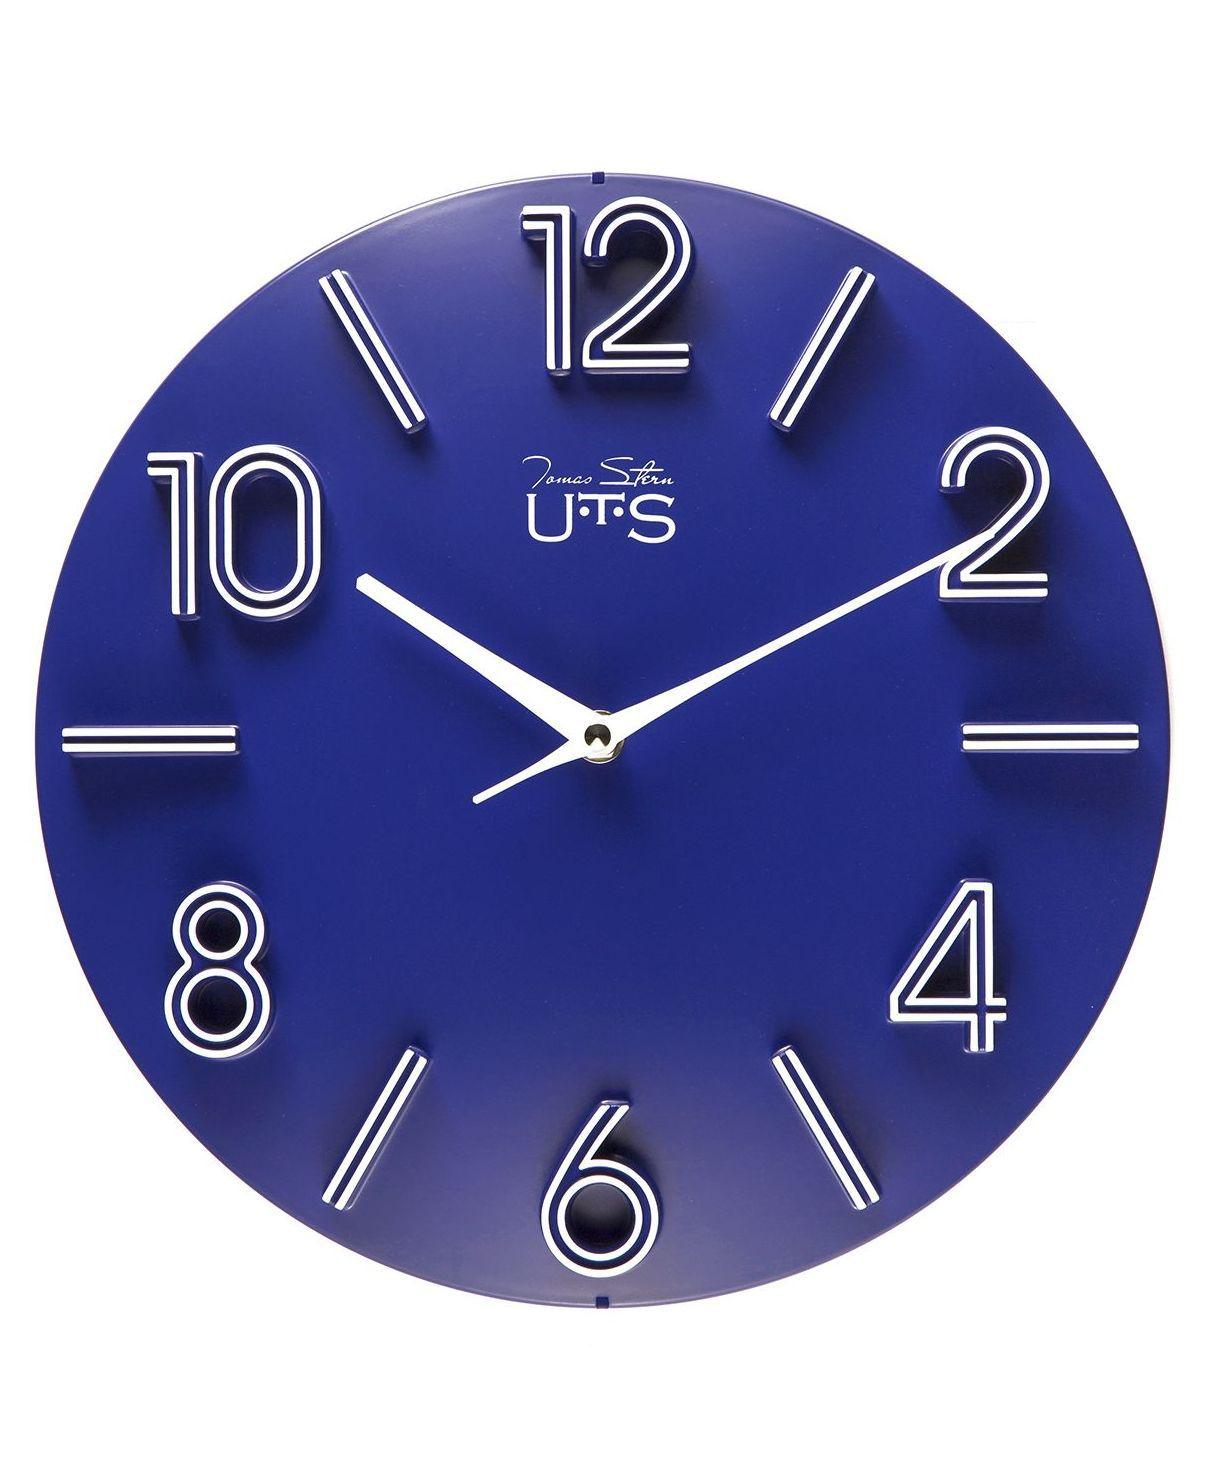 Часы настенные Часы настенные Tomas Stern 9002 chasy-nastennye-tomas-stern-9002-germaniya.jpg